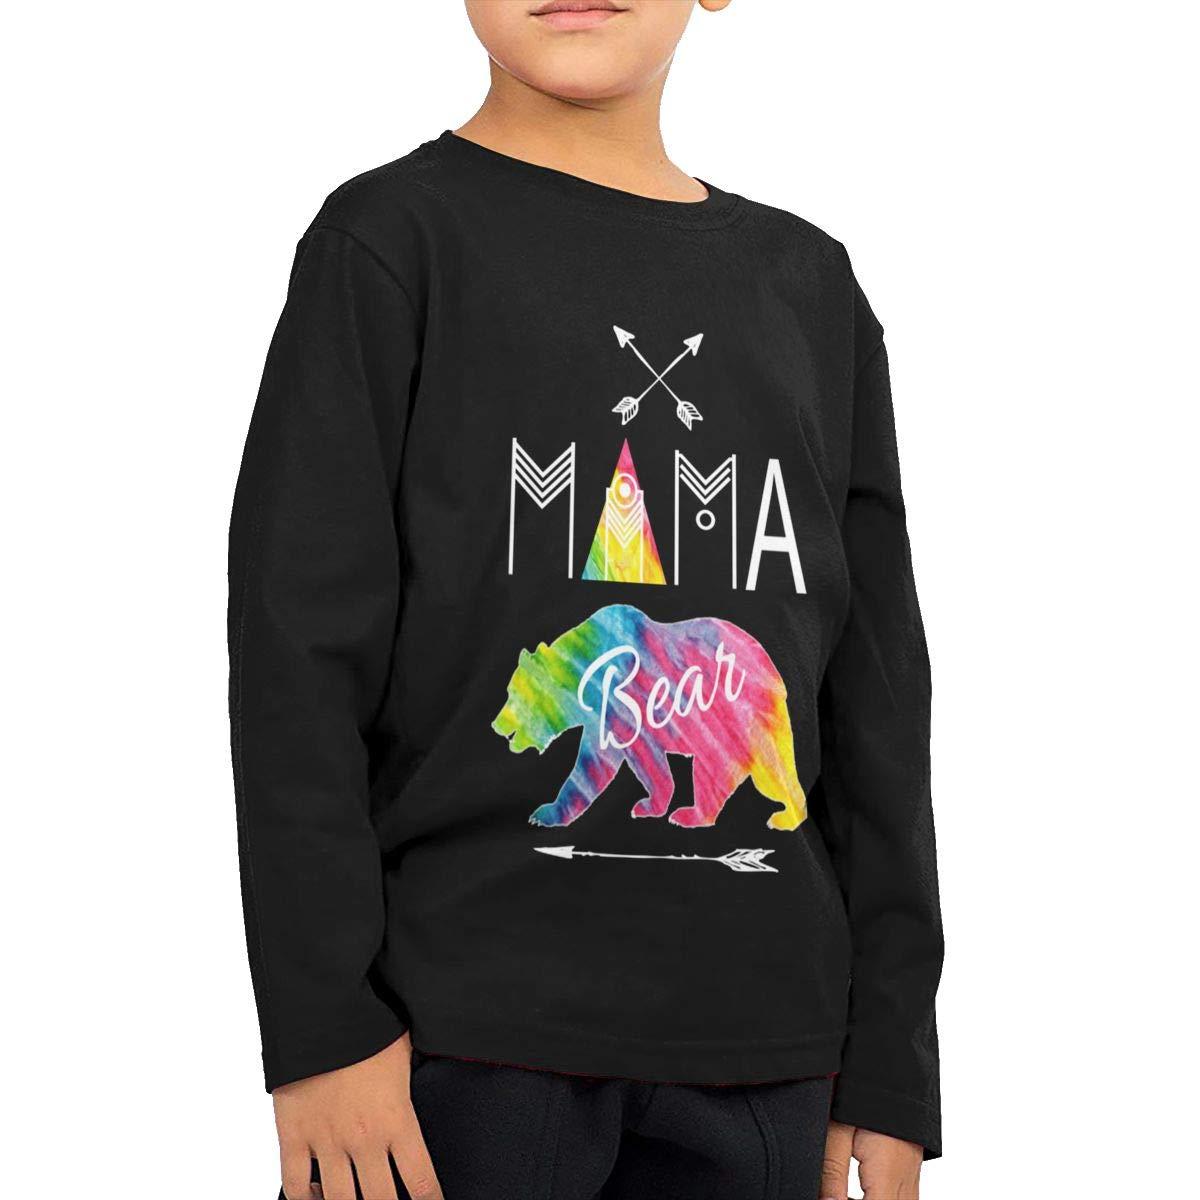 Mama Bear Childrens Long Sleeve T-Shirt Boys Cotton Tee Tops